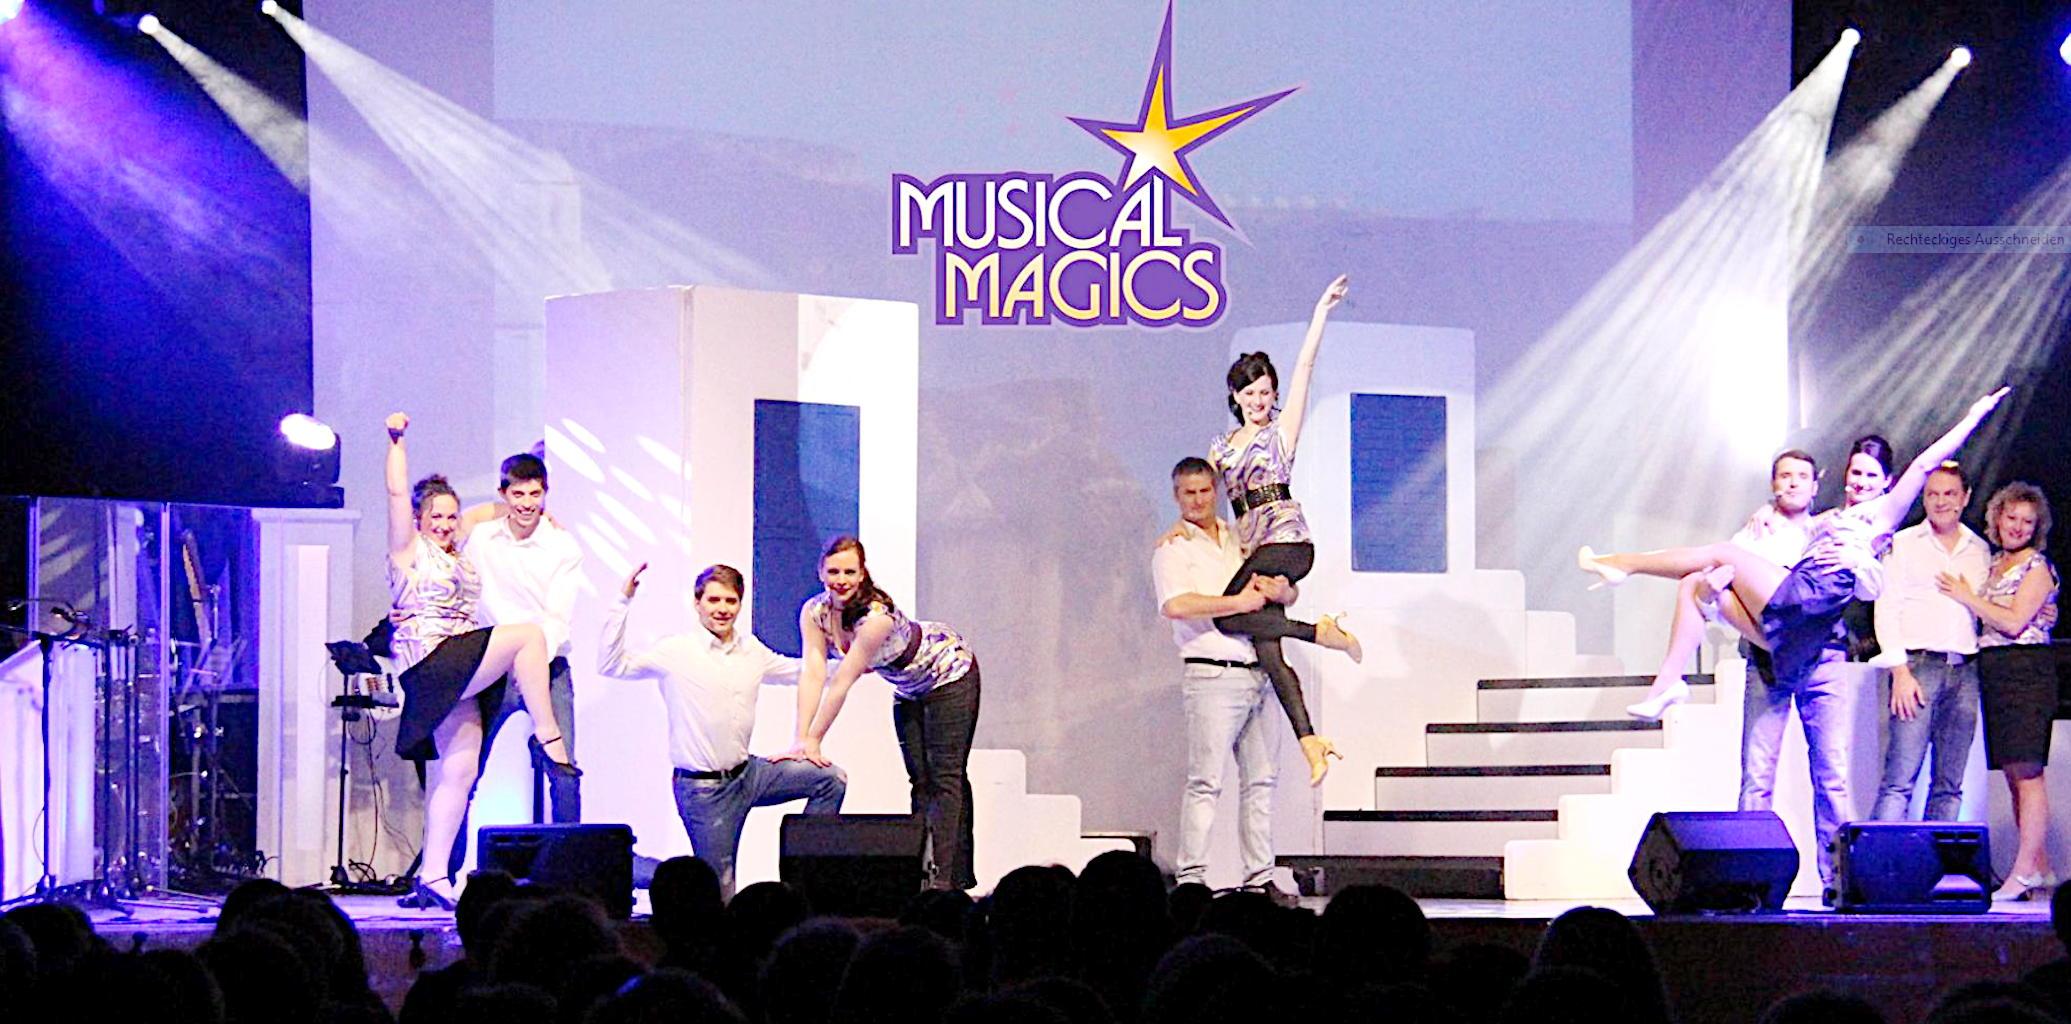 musical-magics-2020